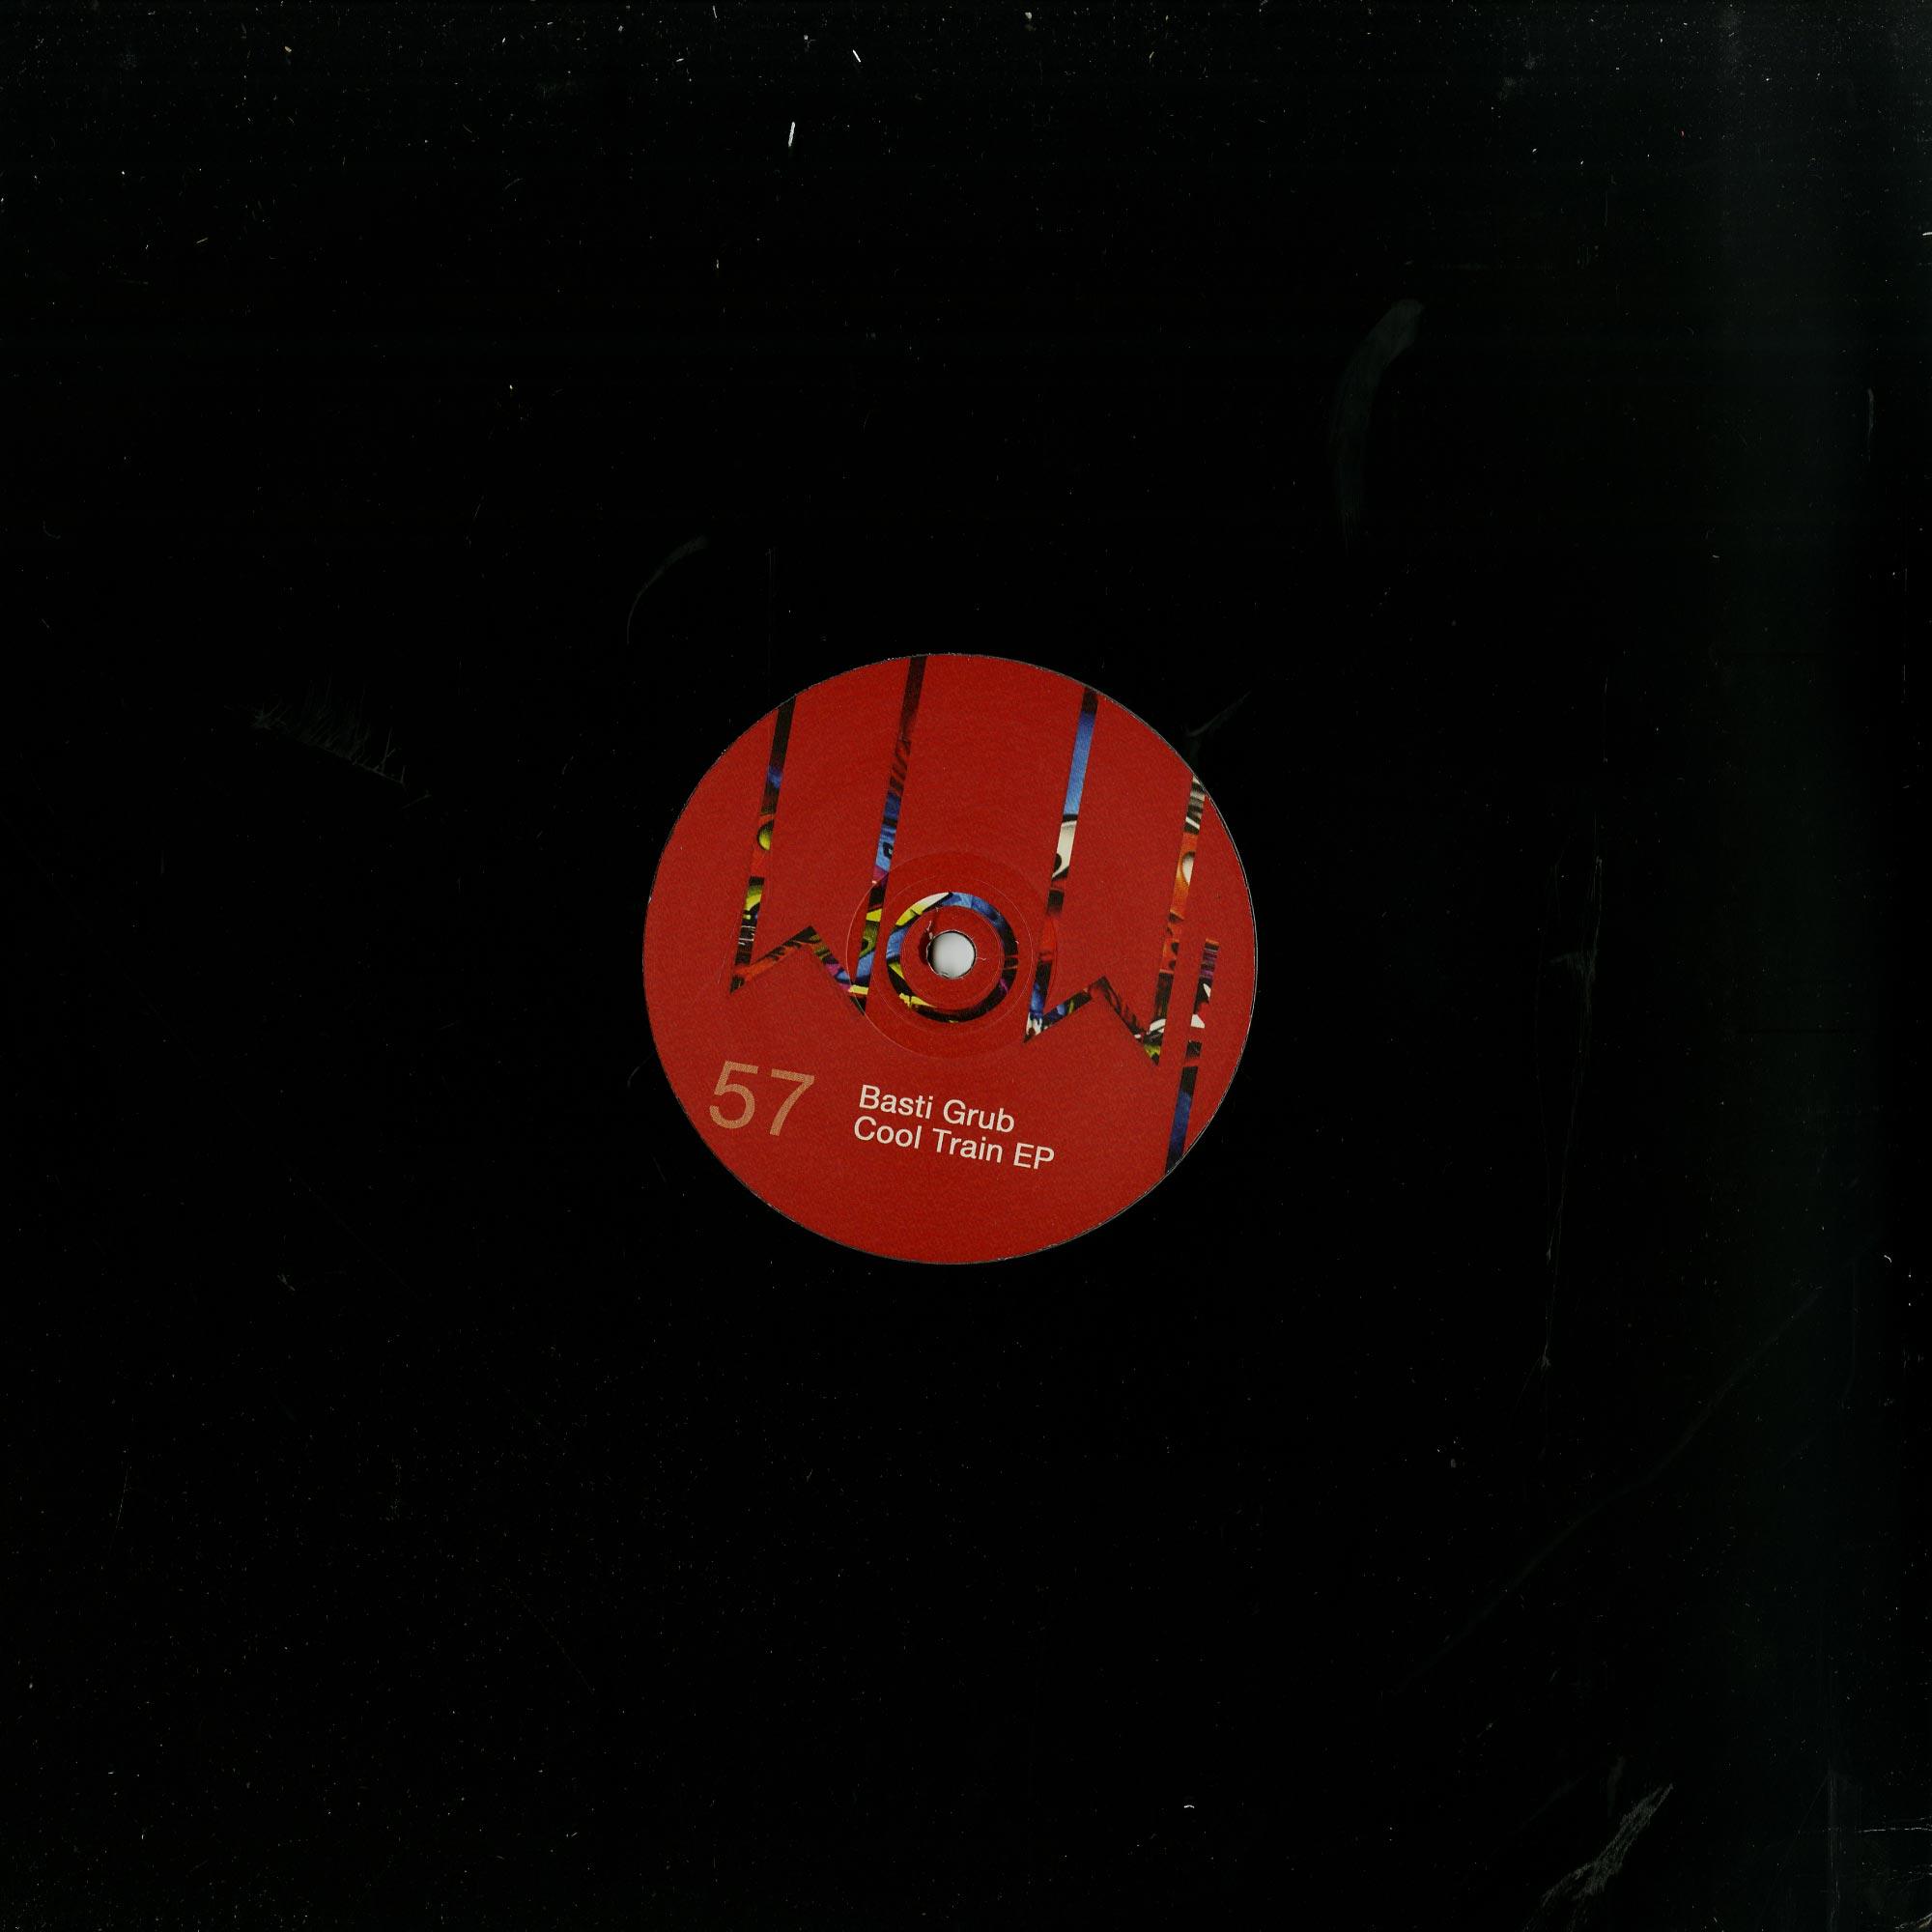 Basti Grub - COOL TRAIN EP